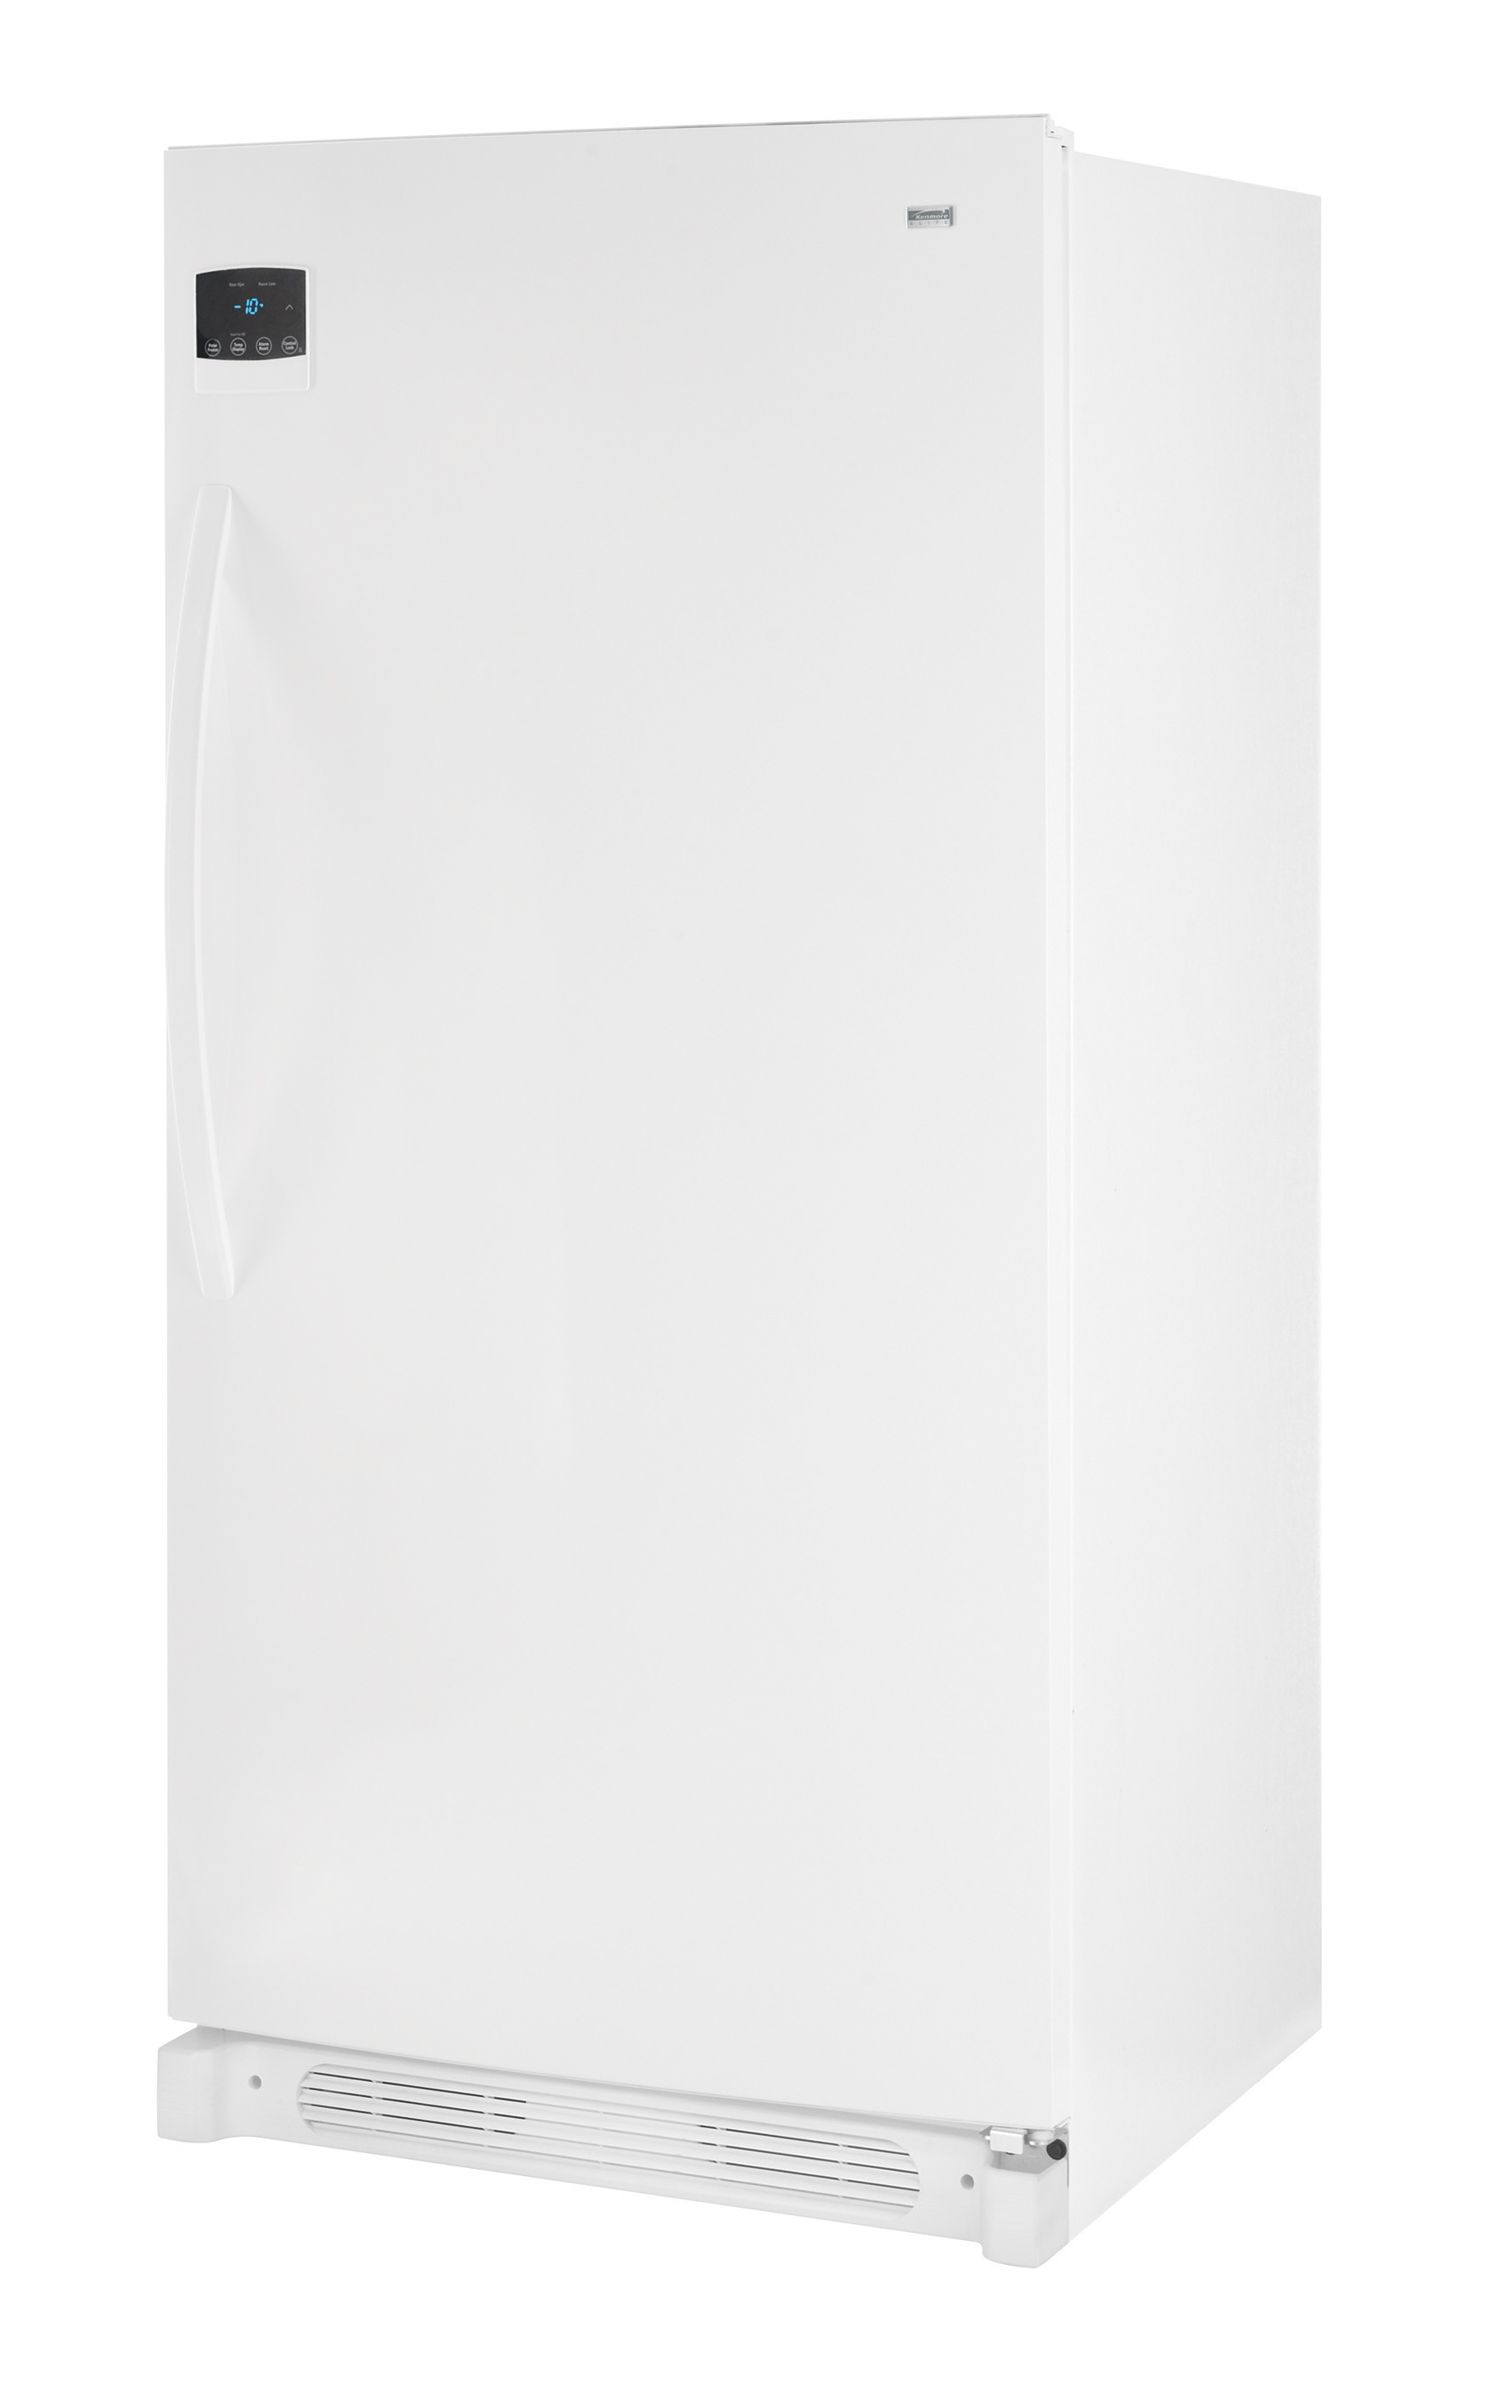 Kenmore Elite 20.6 cu. ft. Upright Freezer